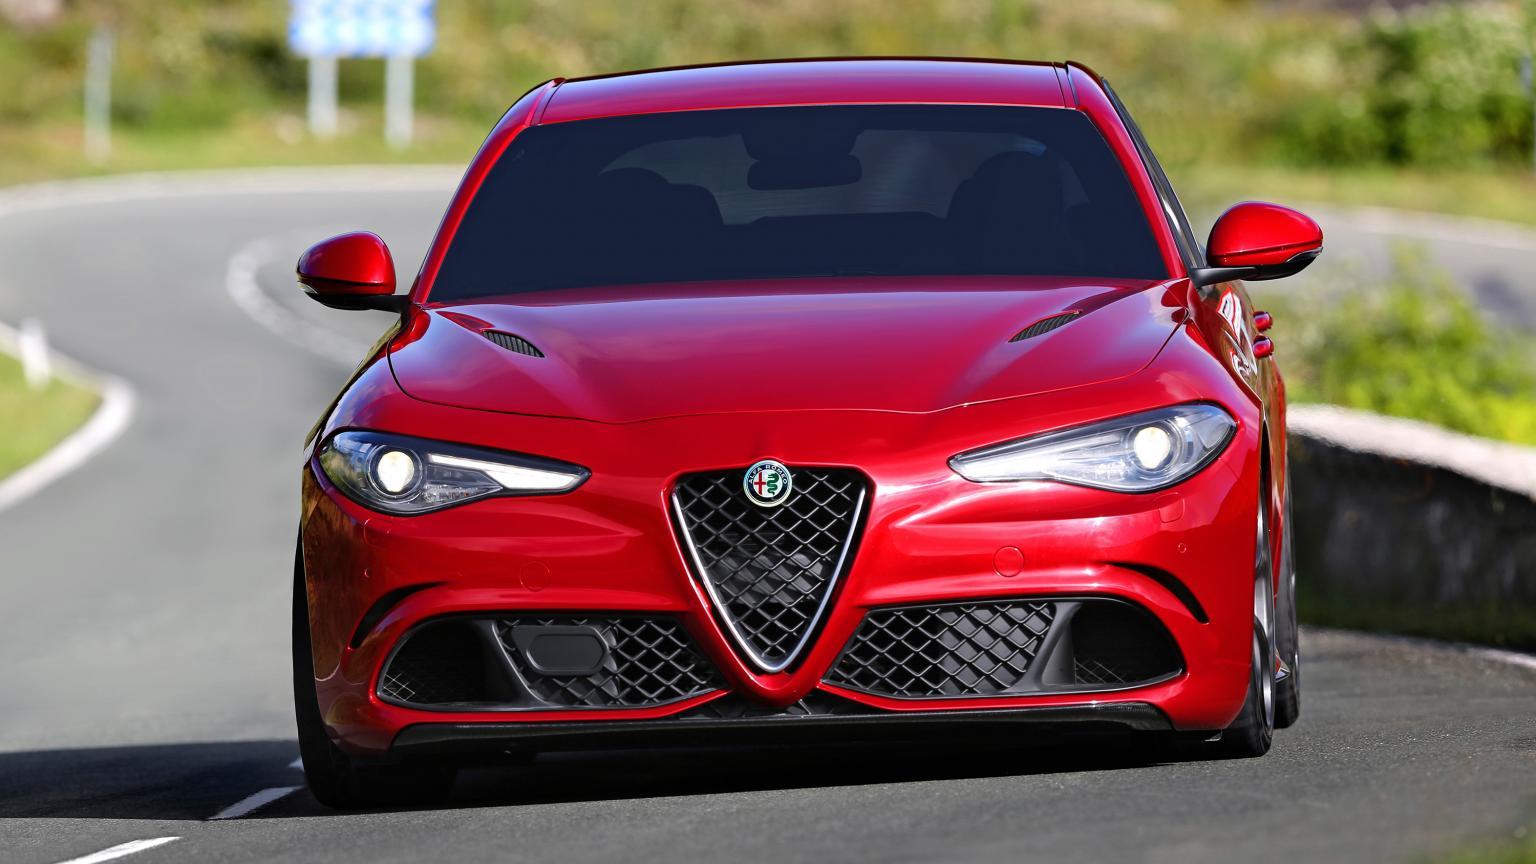 TopGear | Video: the Alfa Romeo Giulia is a Nürburgring hero